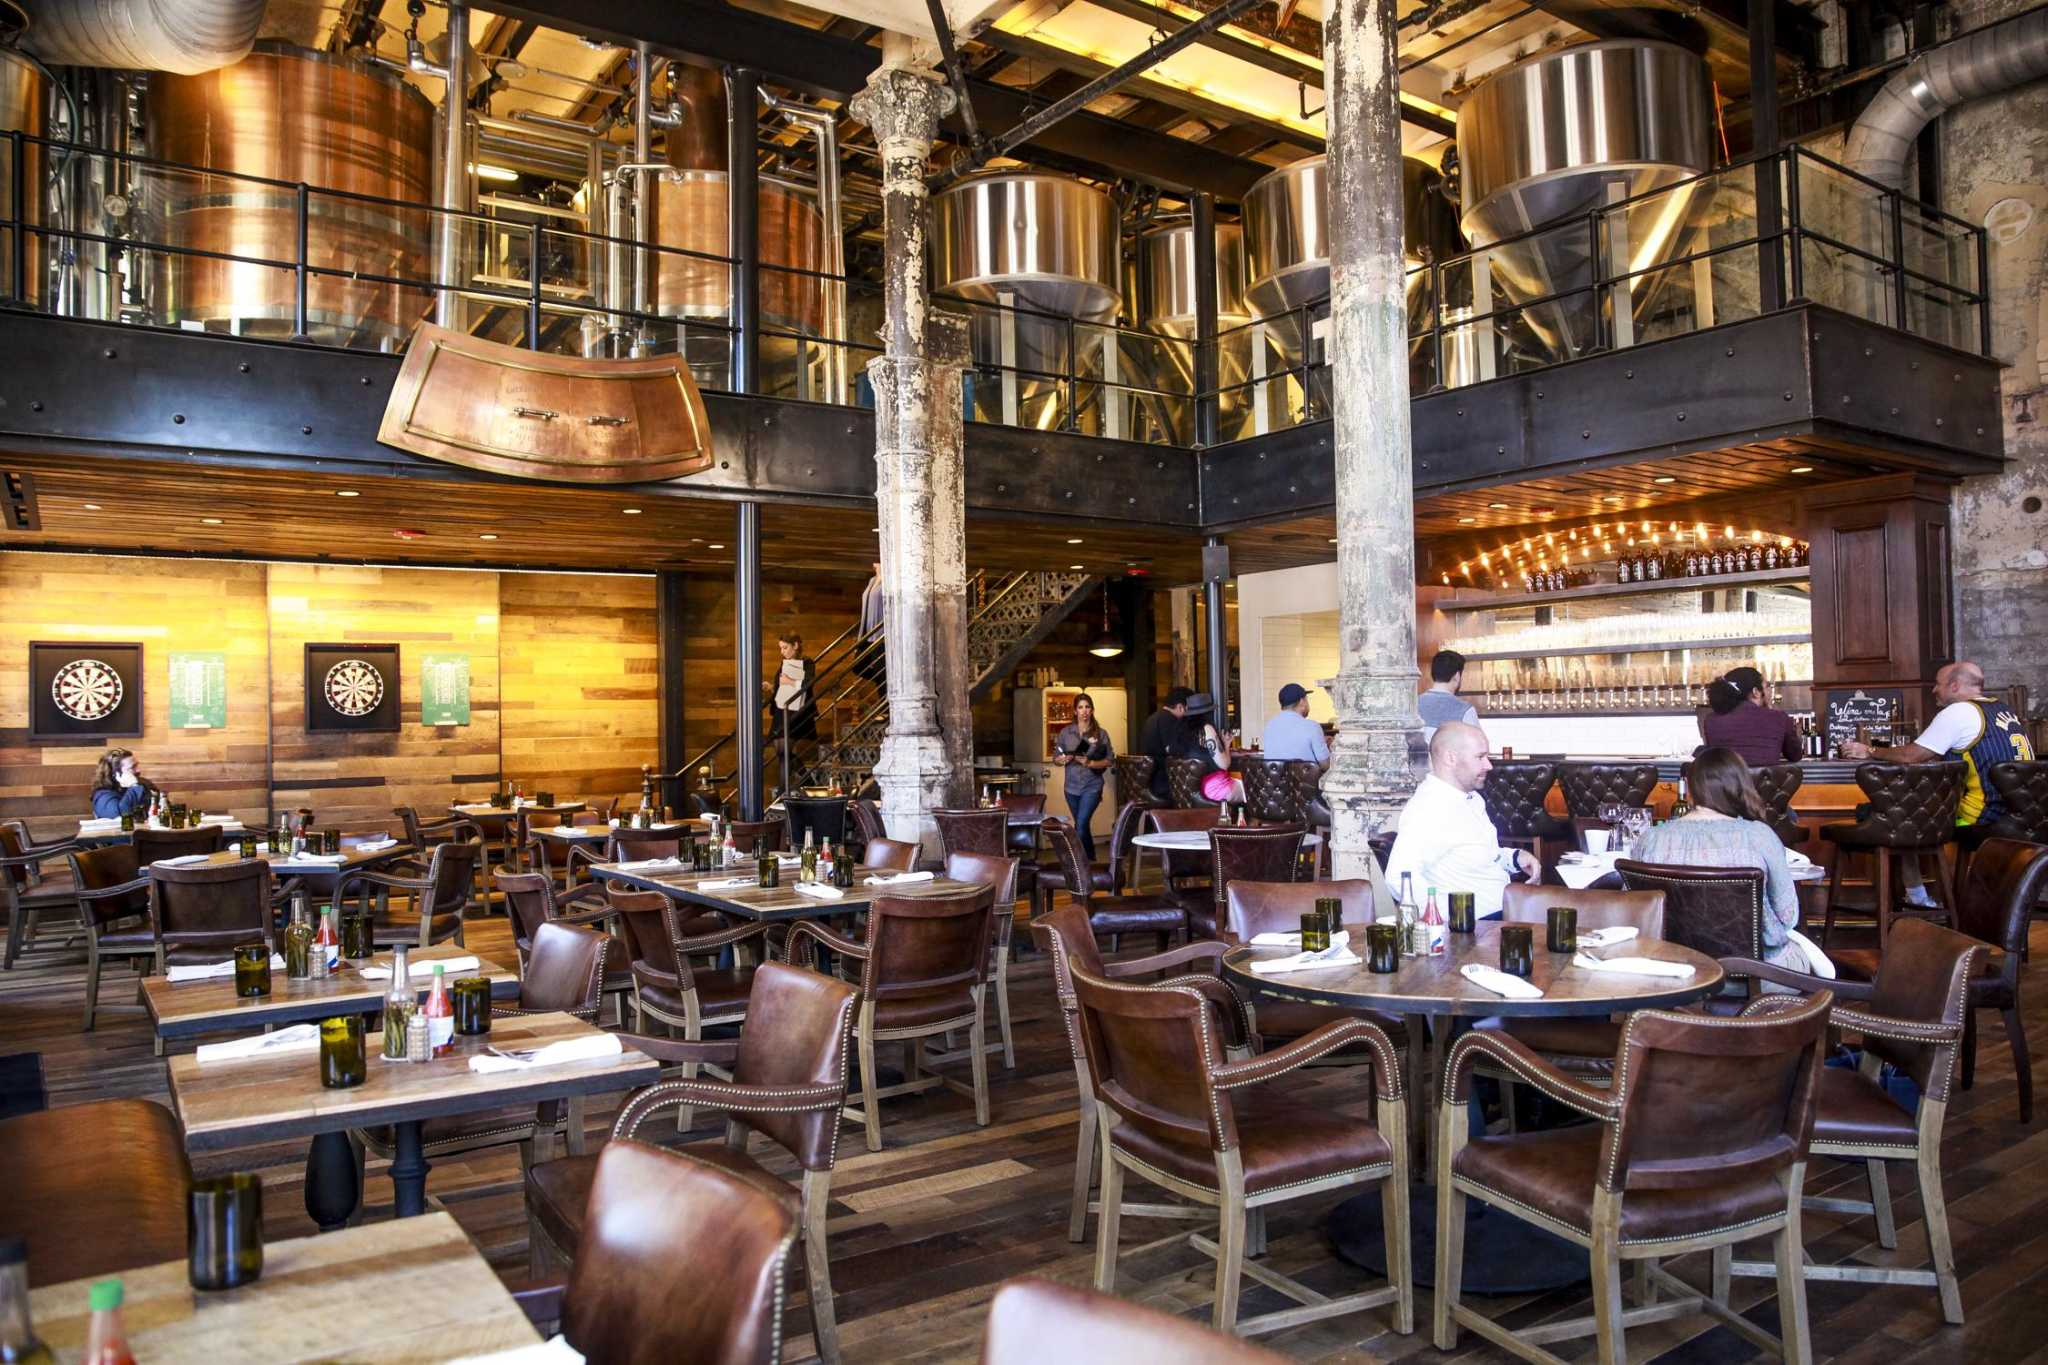 8 Best Breweries in San Antonio - visitsanantonio.com